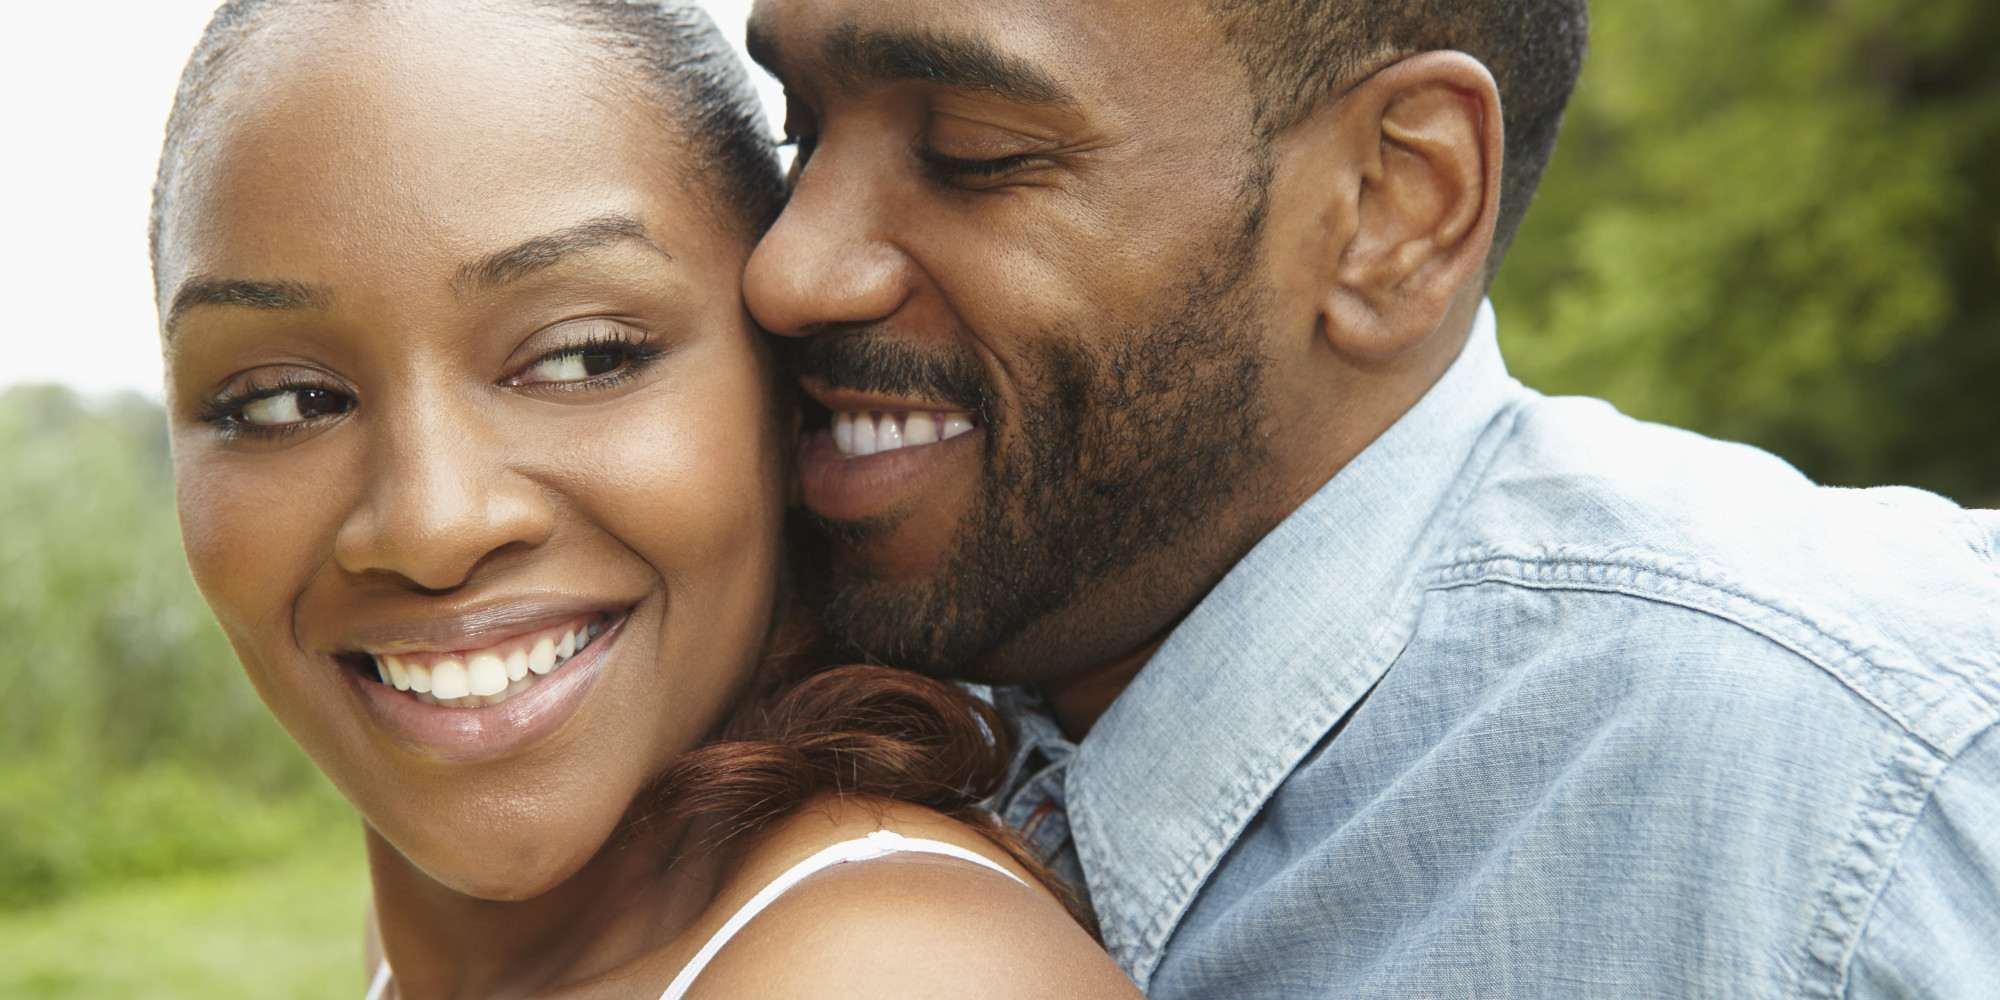 Naija dating nigerian guys